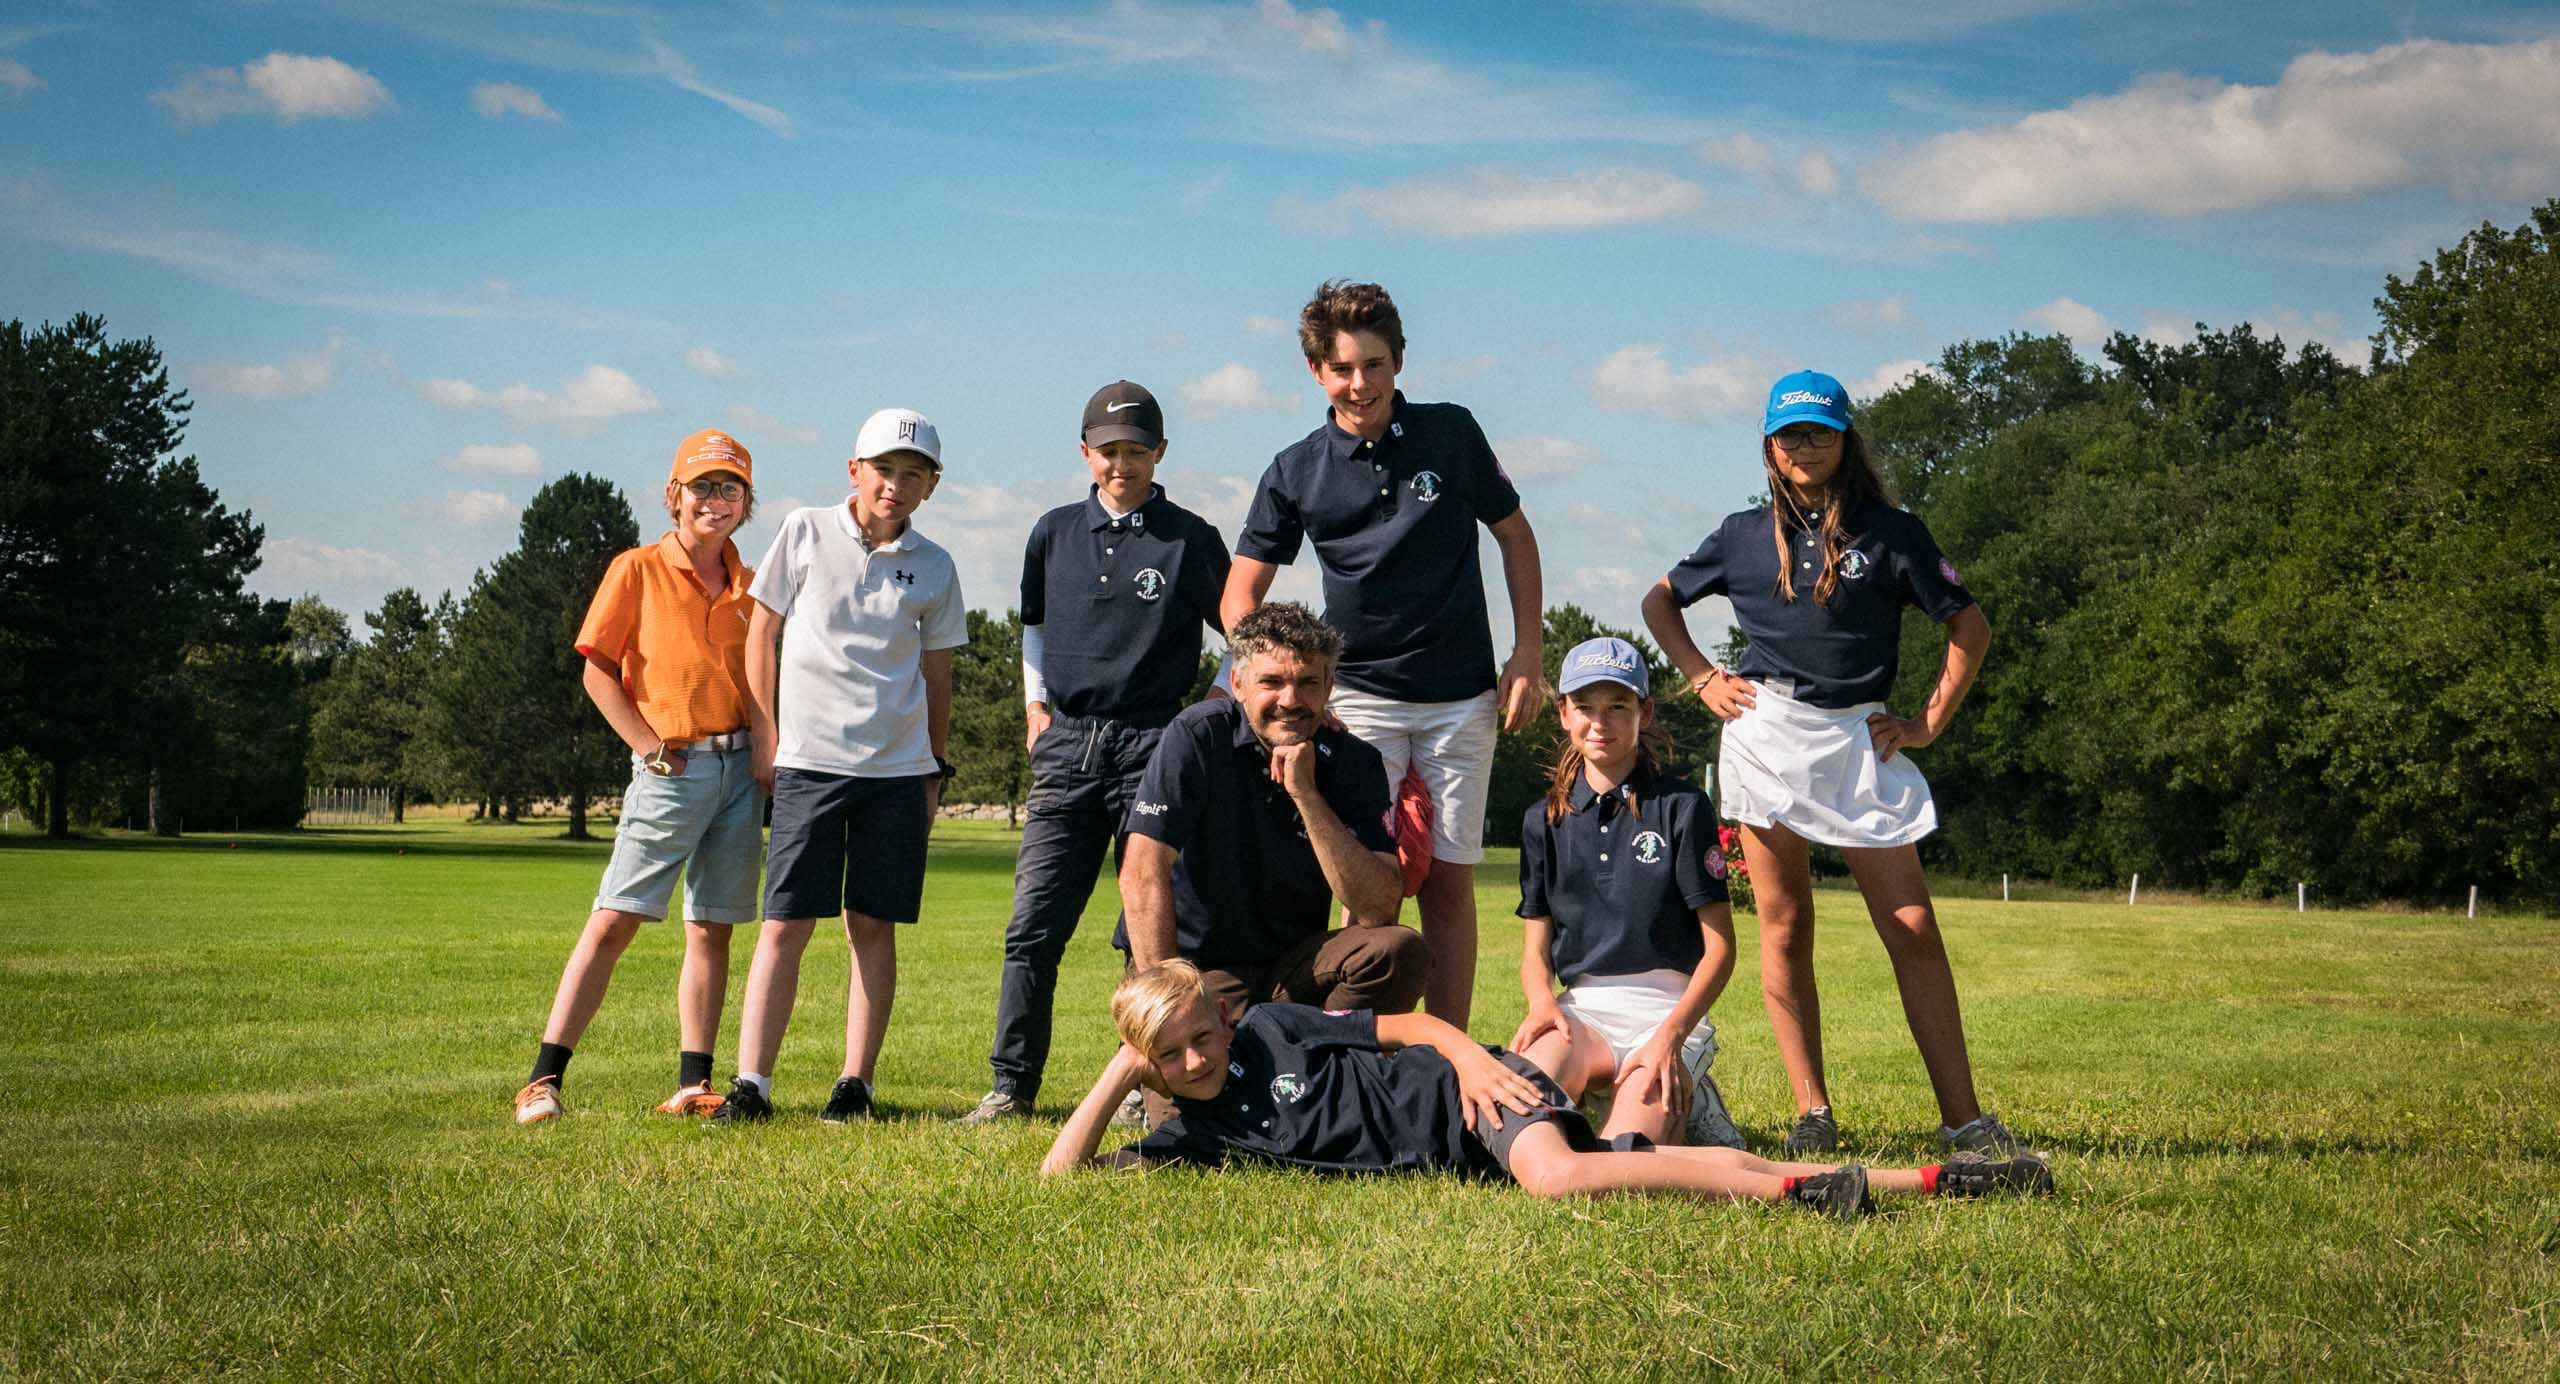 Championnat Regional Jeunes 2019 T2 Valence Saint Didier 68